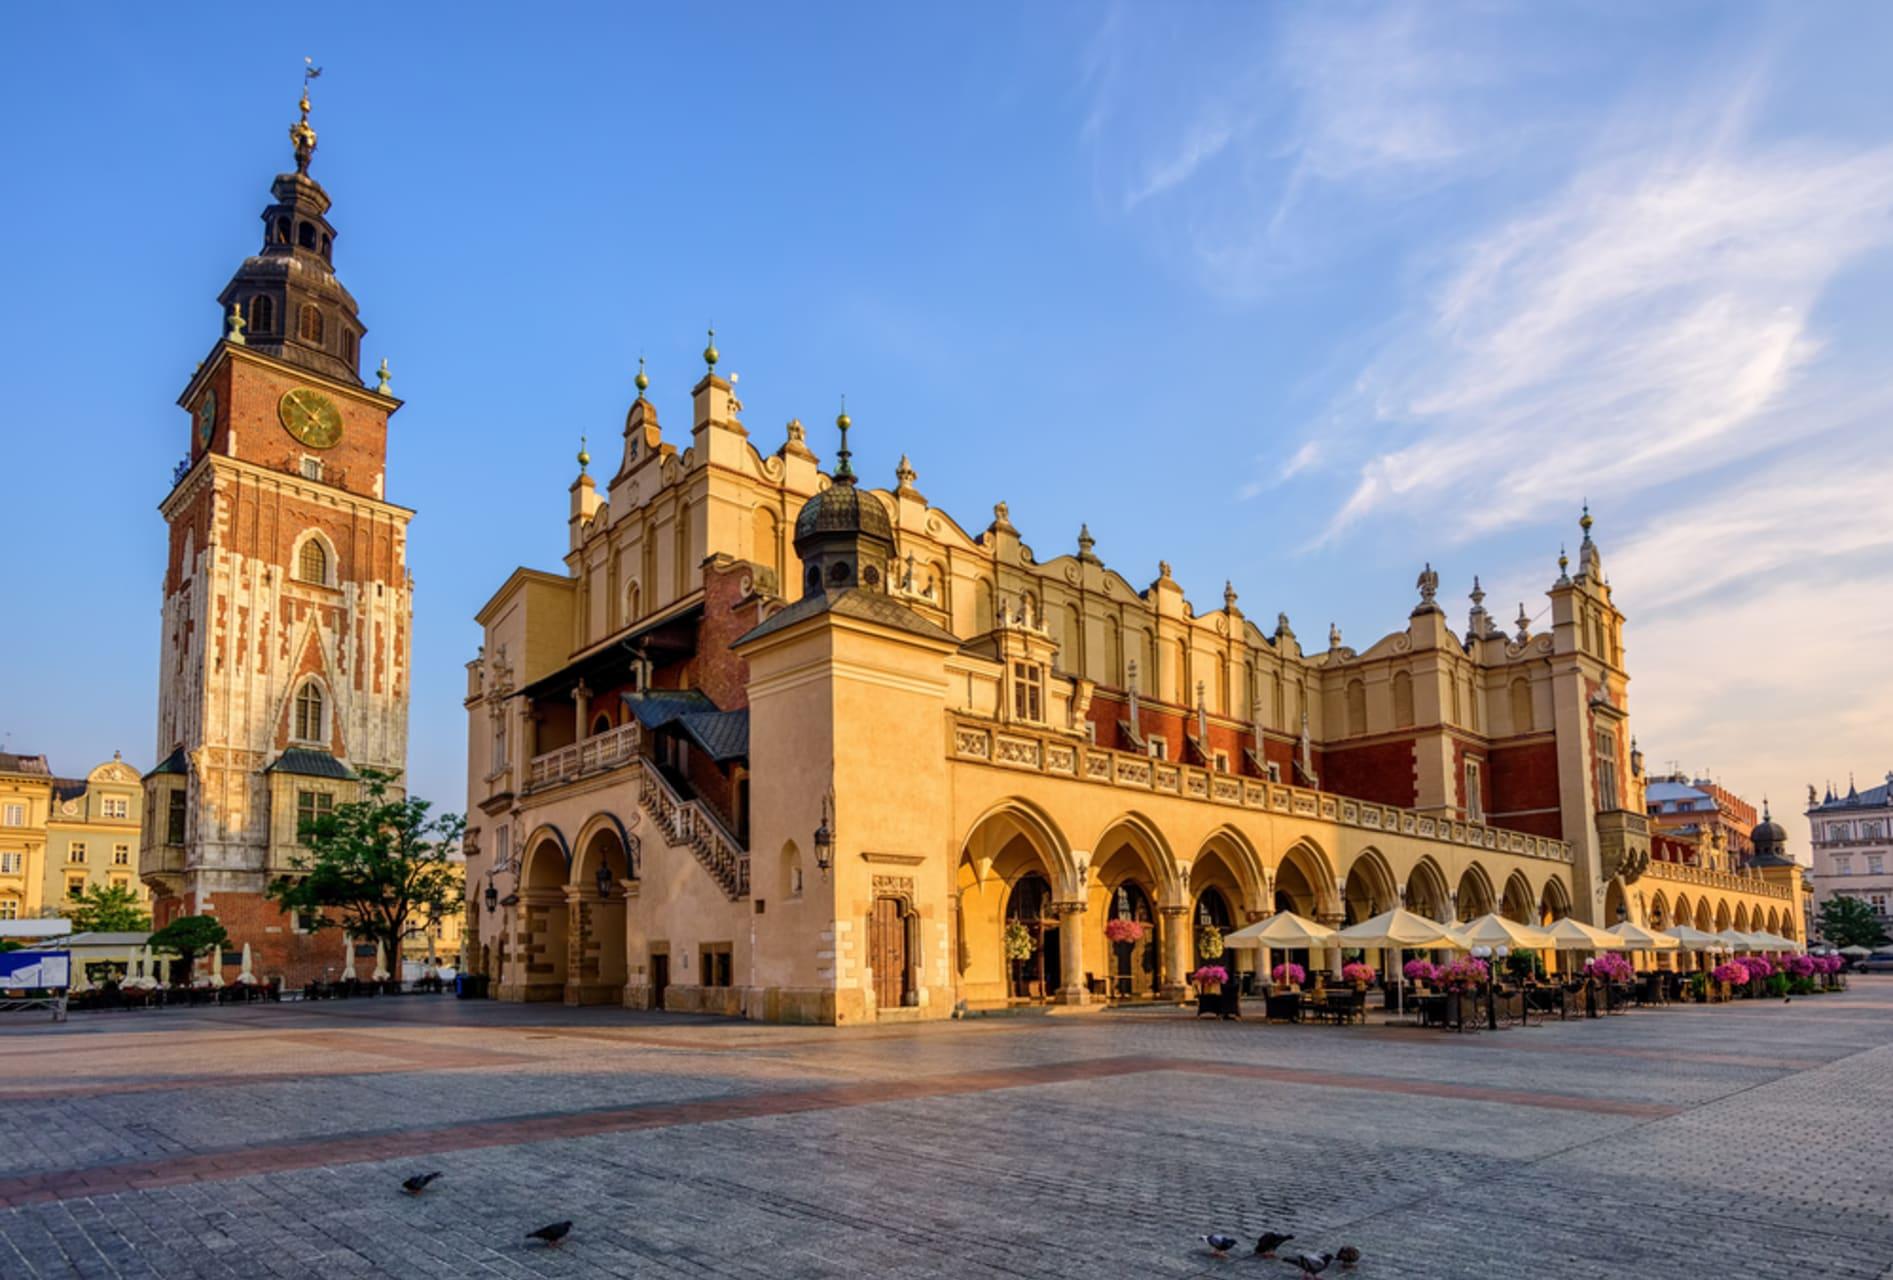 Krakow - Around the oldest shopping mall in Europe, Sukiennice